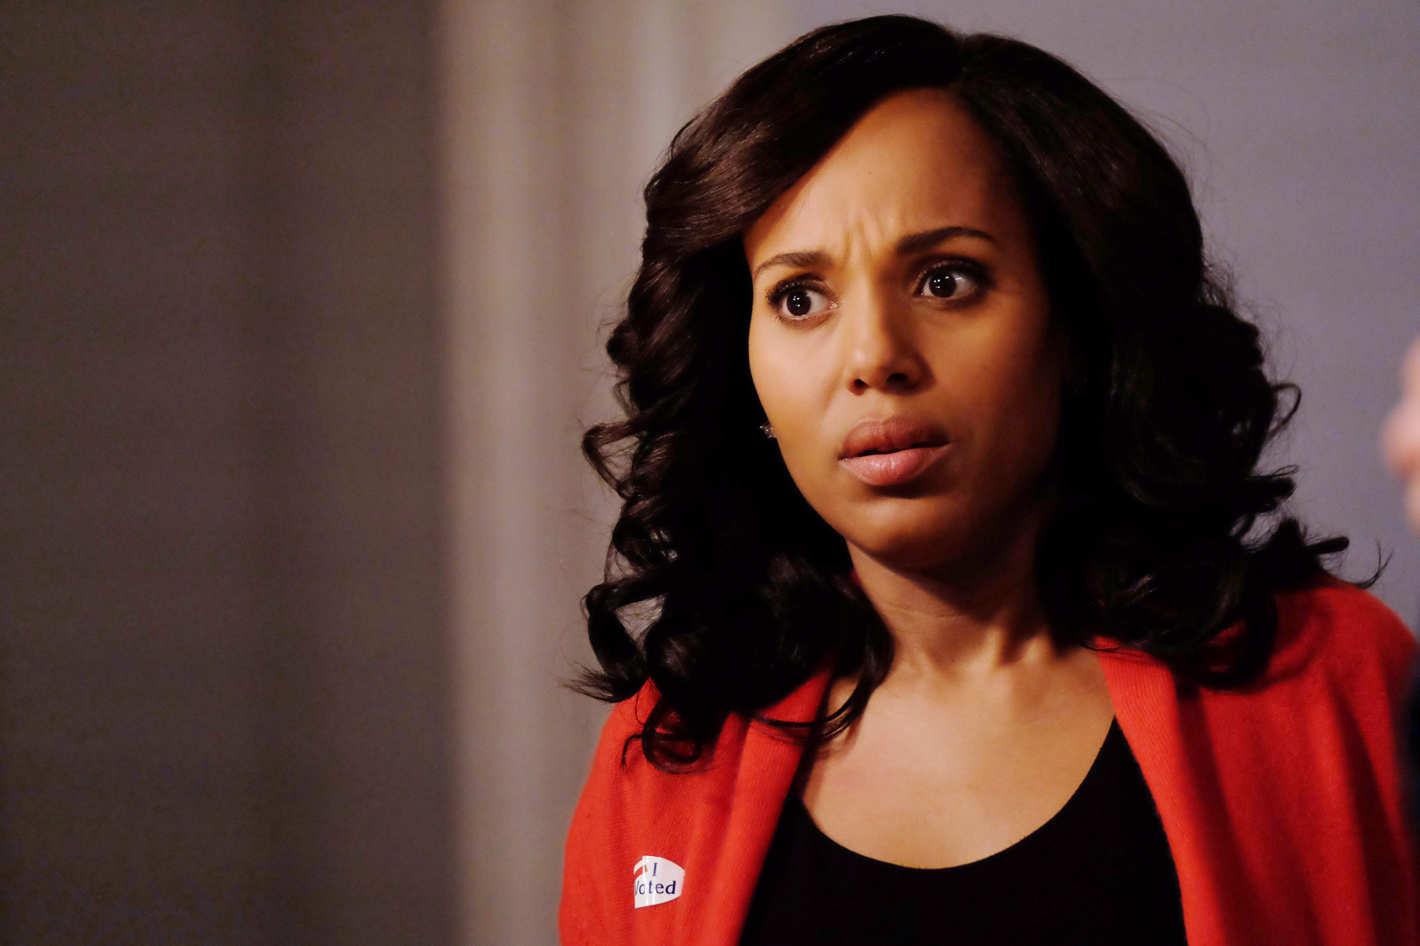 scandal recap season 6 episode 8 a stomach for blood